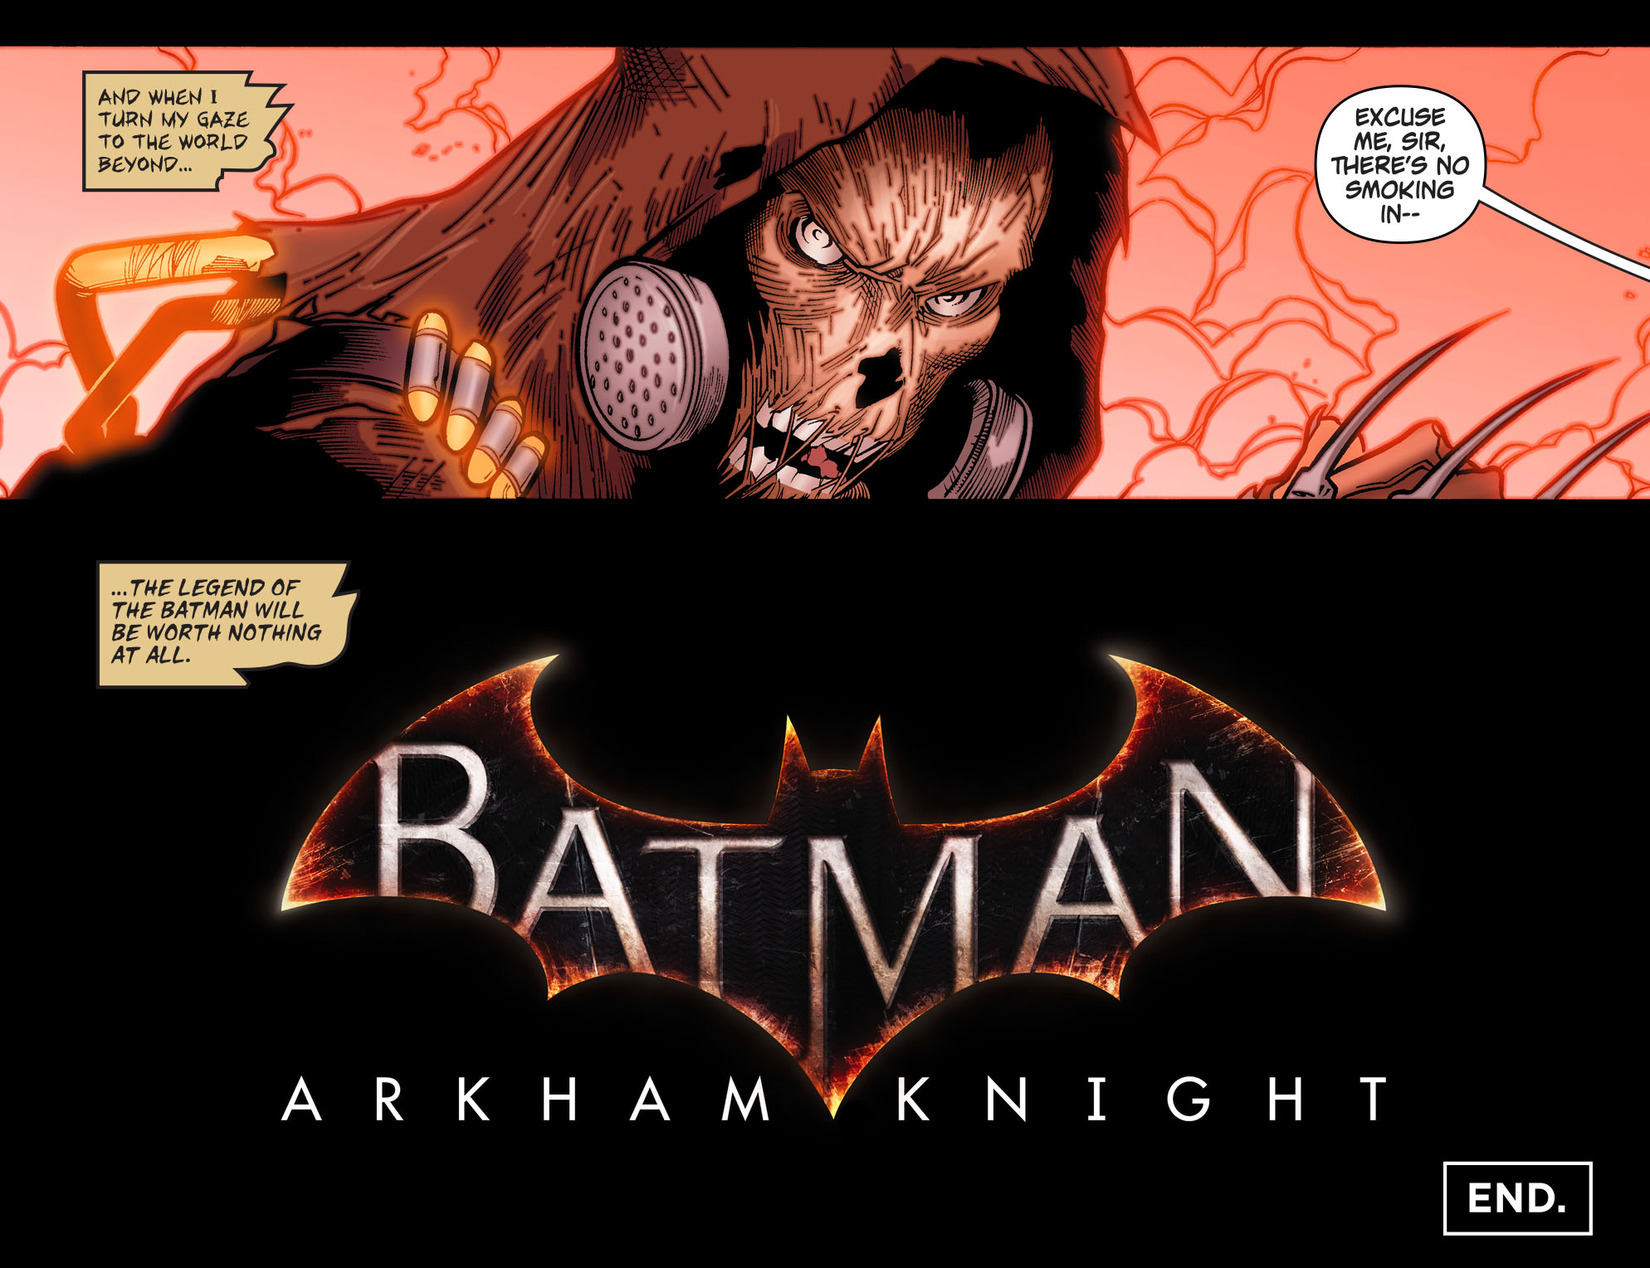 Batman: Arkham Knight [I] chap 39 pic 20